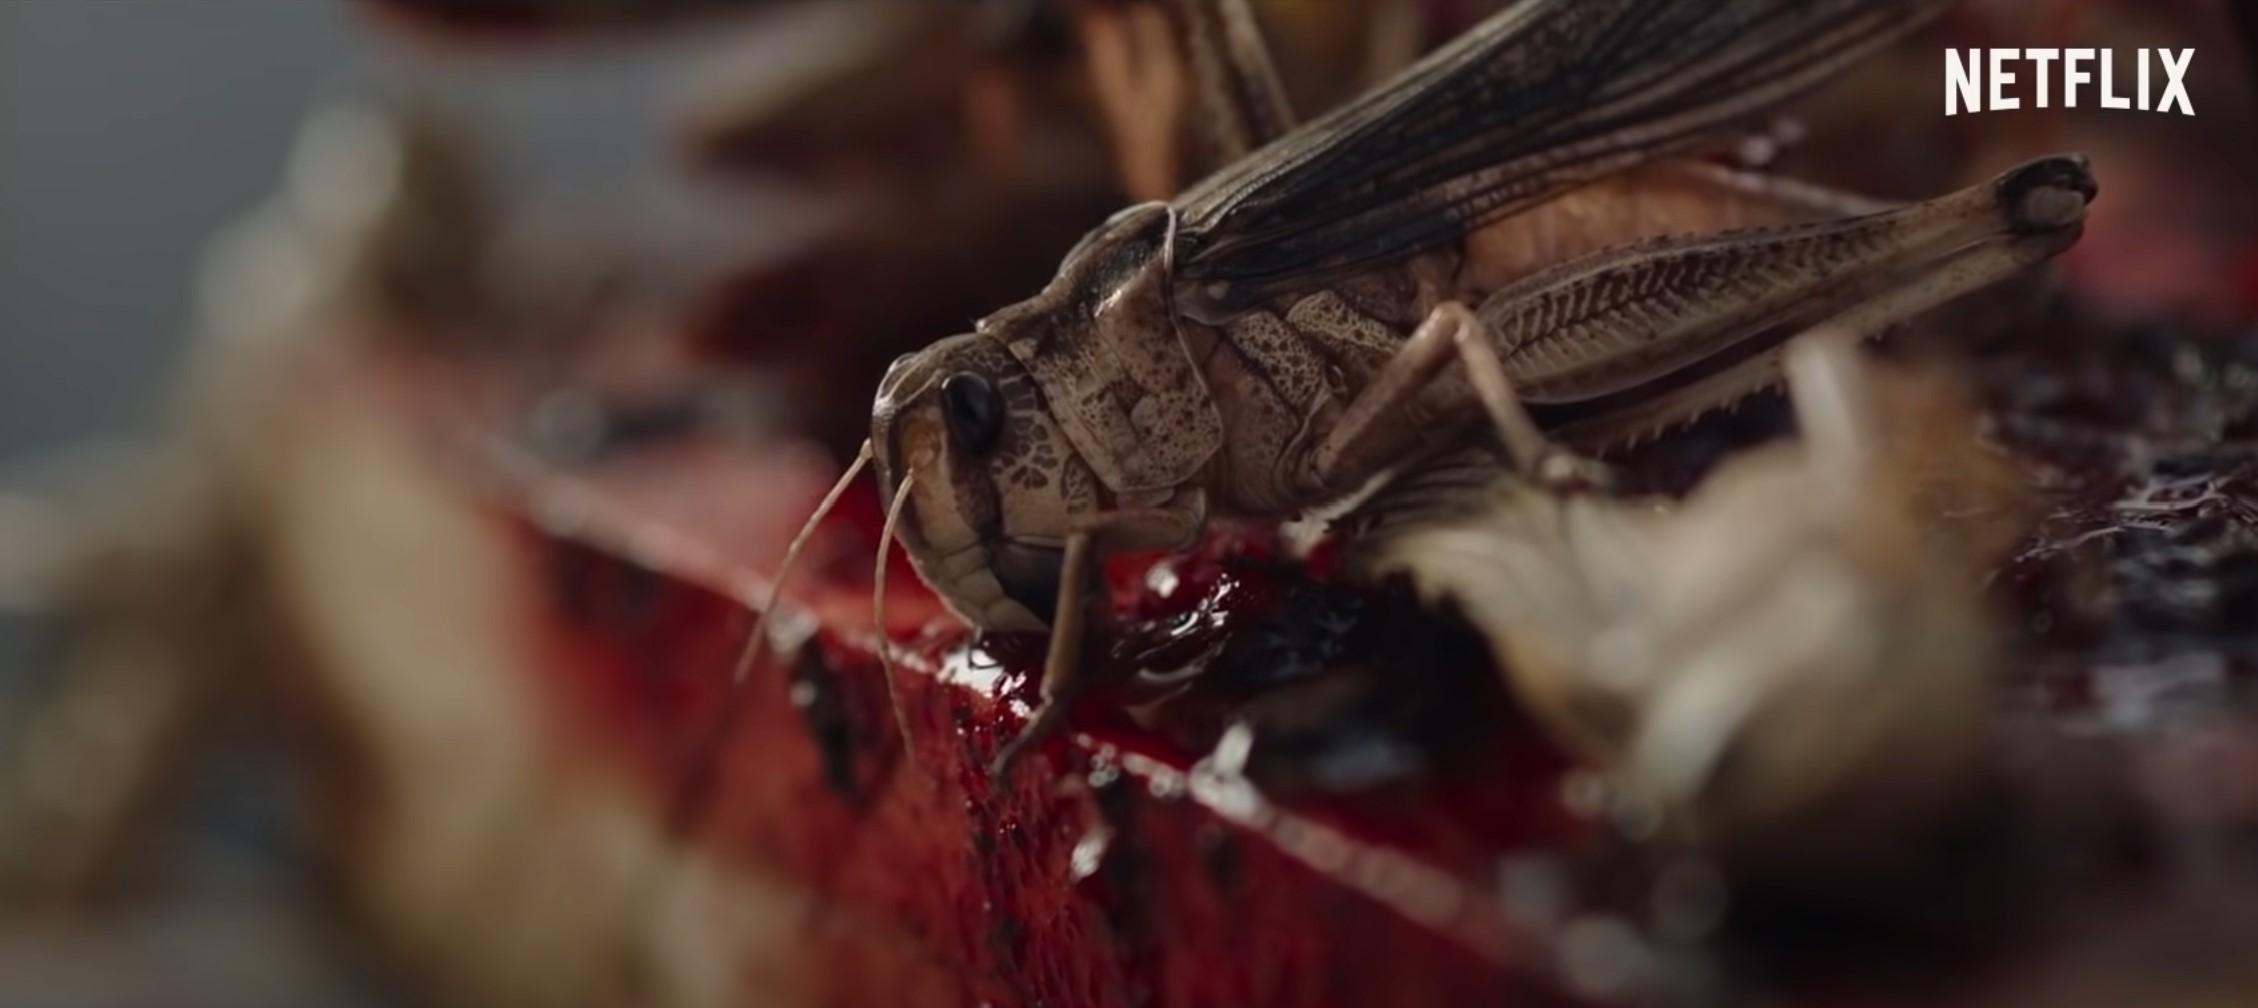 The Swarm : La Nuée French Horror Film | Netflix Release Date